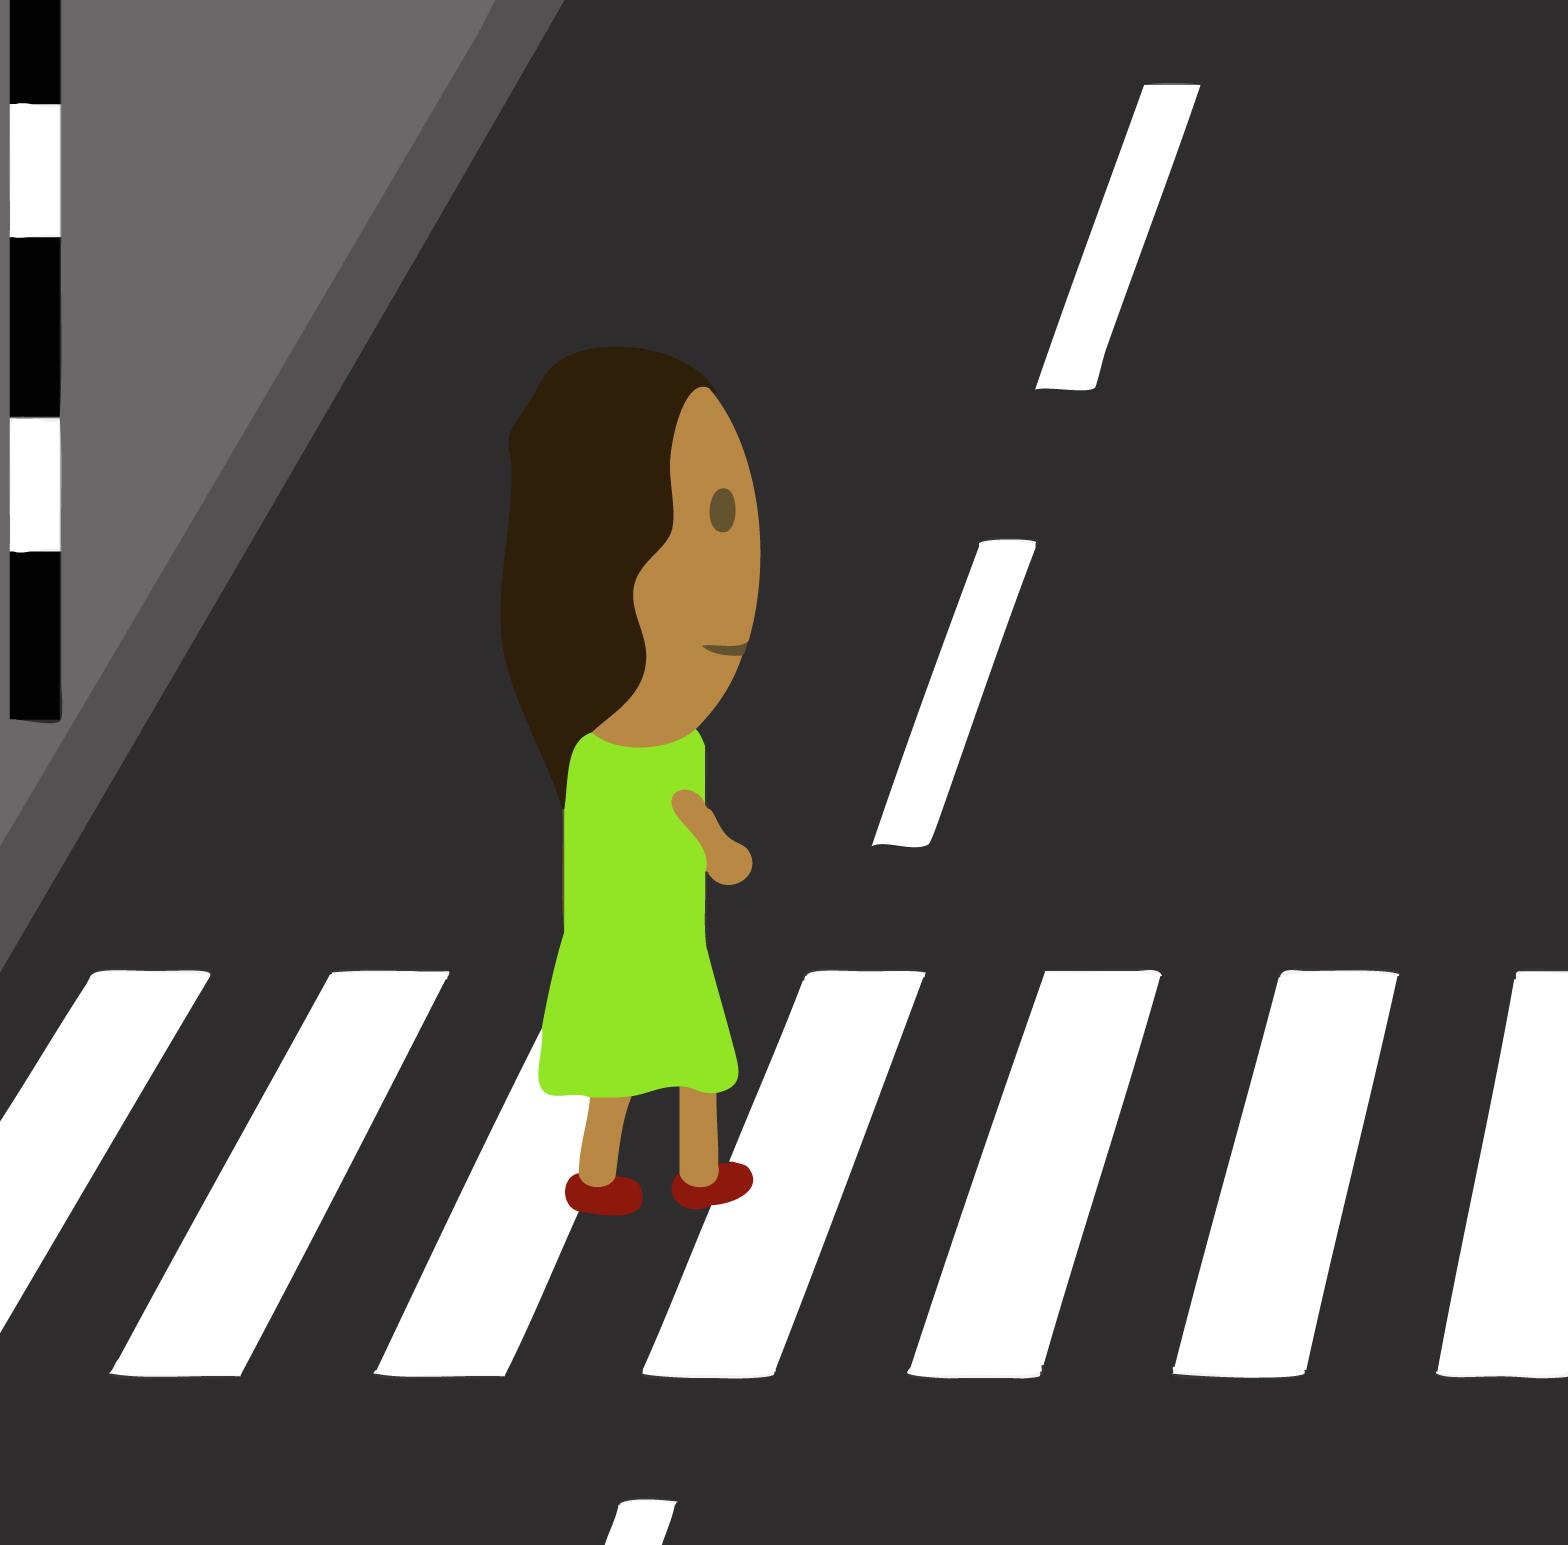 Zebra crossing clipart.